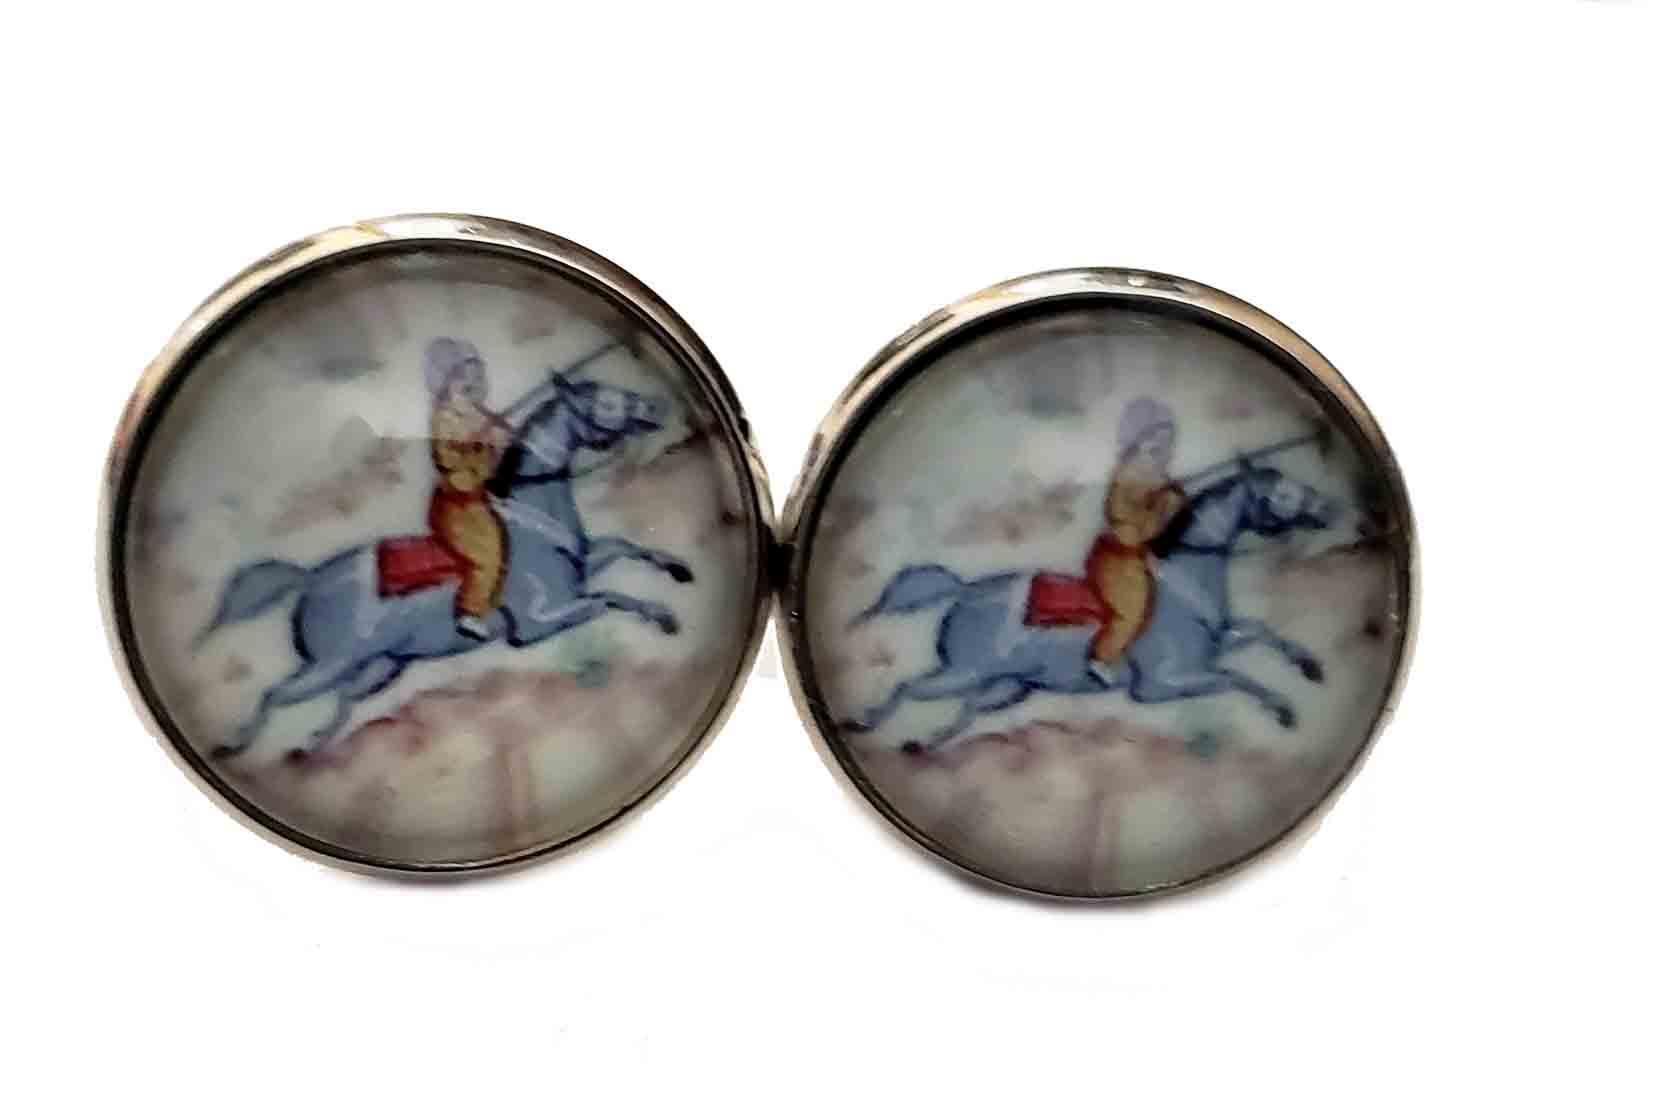 Gascoigne Ancient Polo Player Cufflinks Silver Metal Alloy Men's